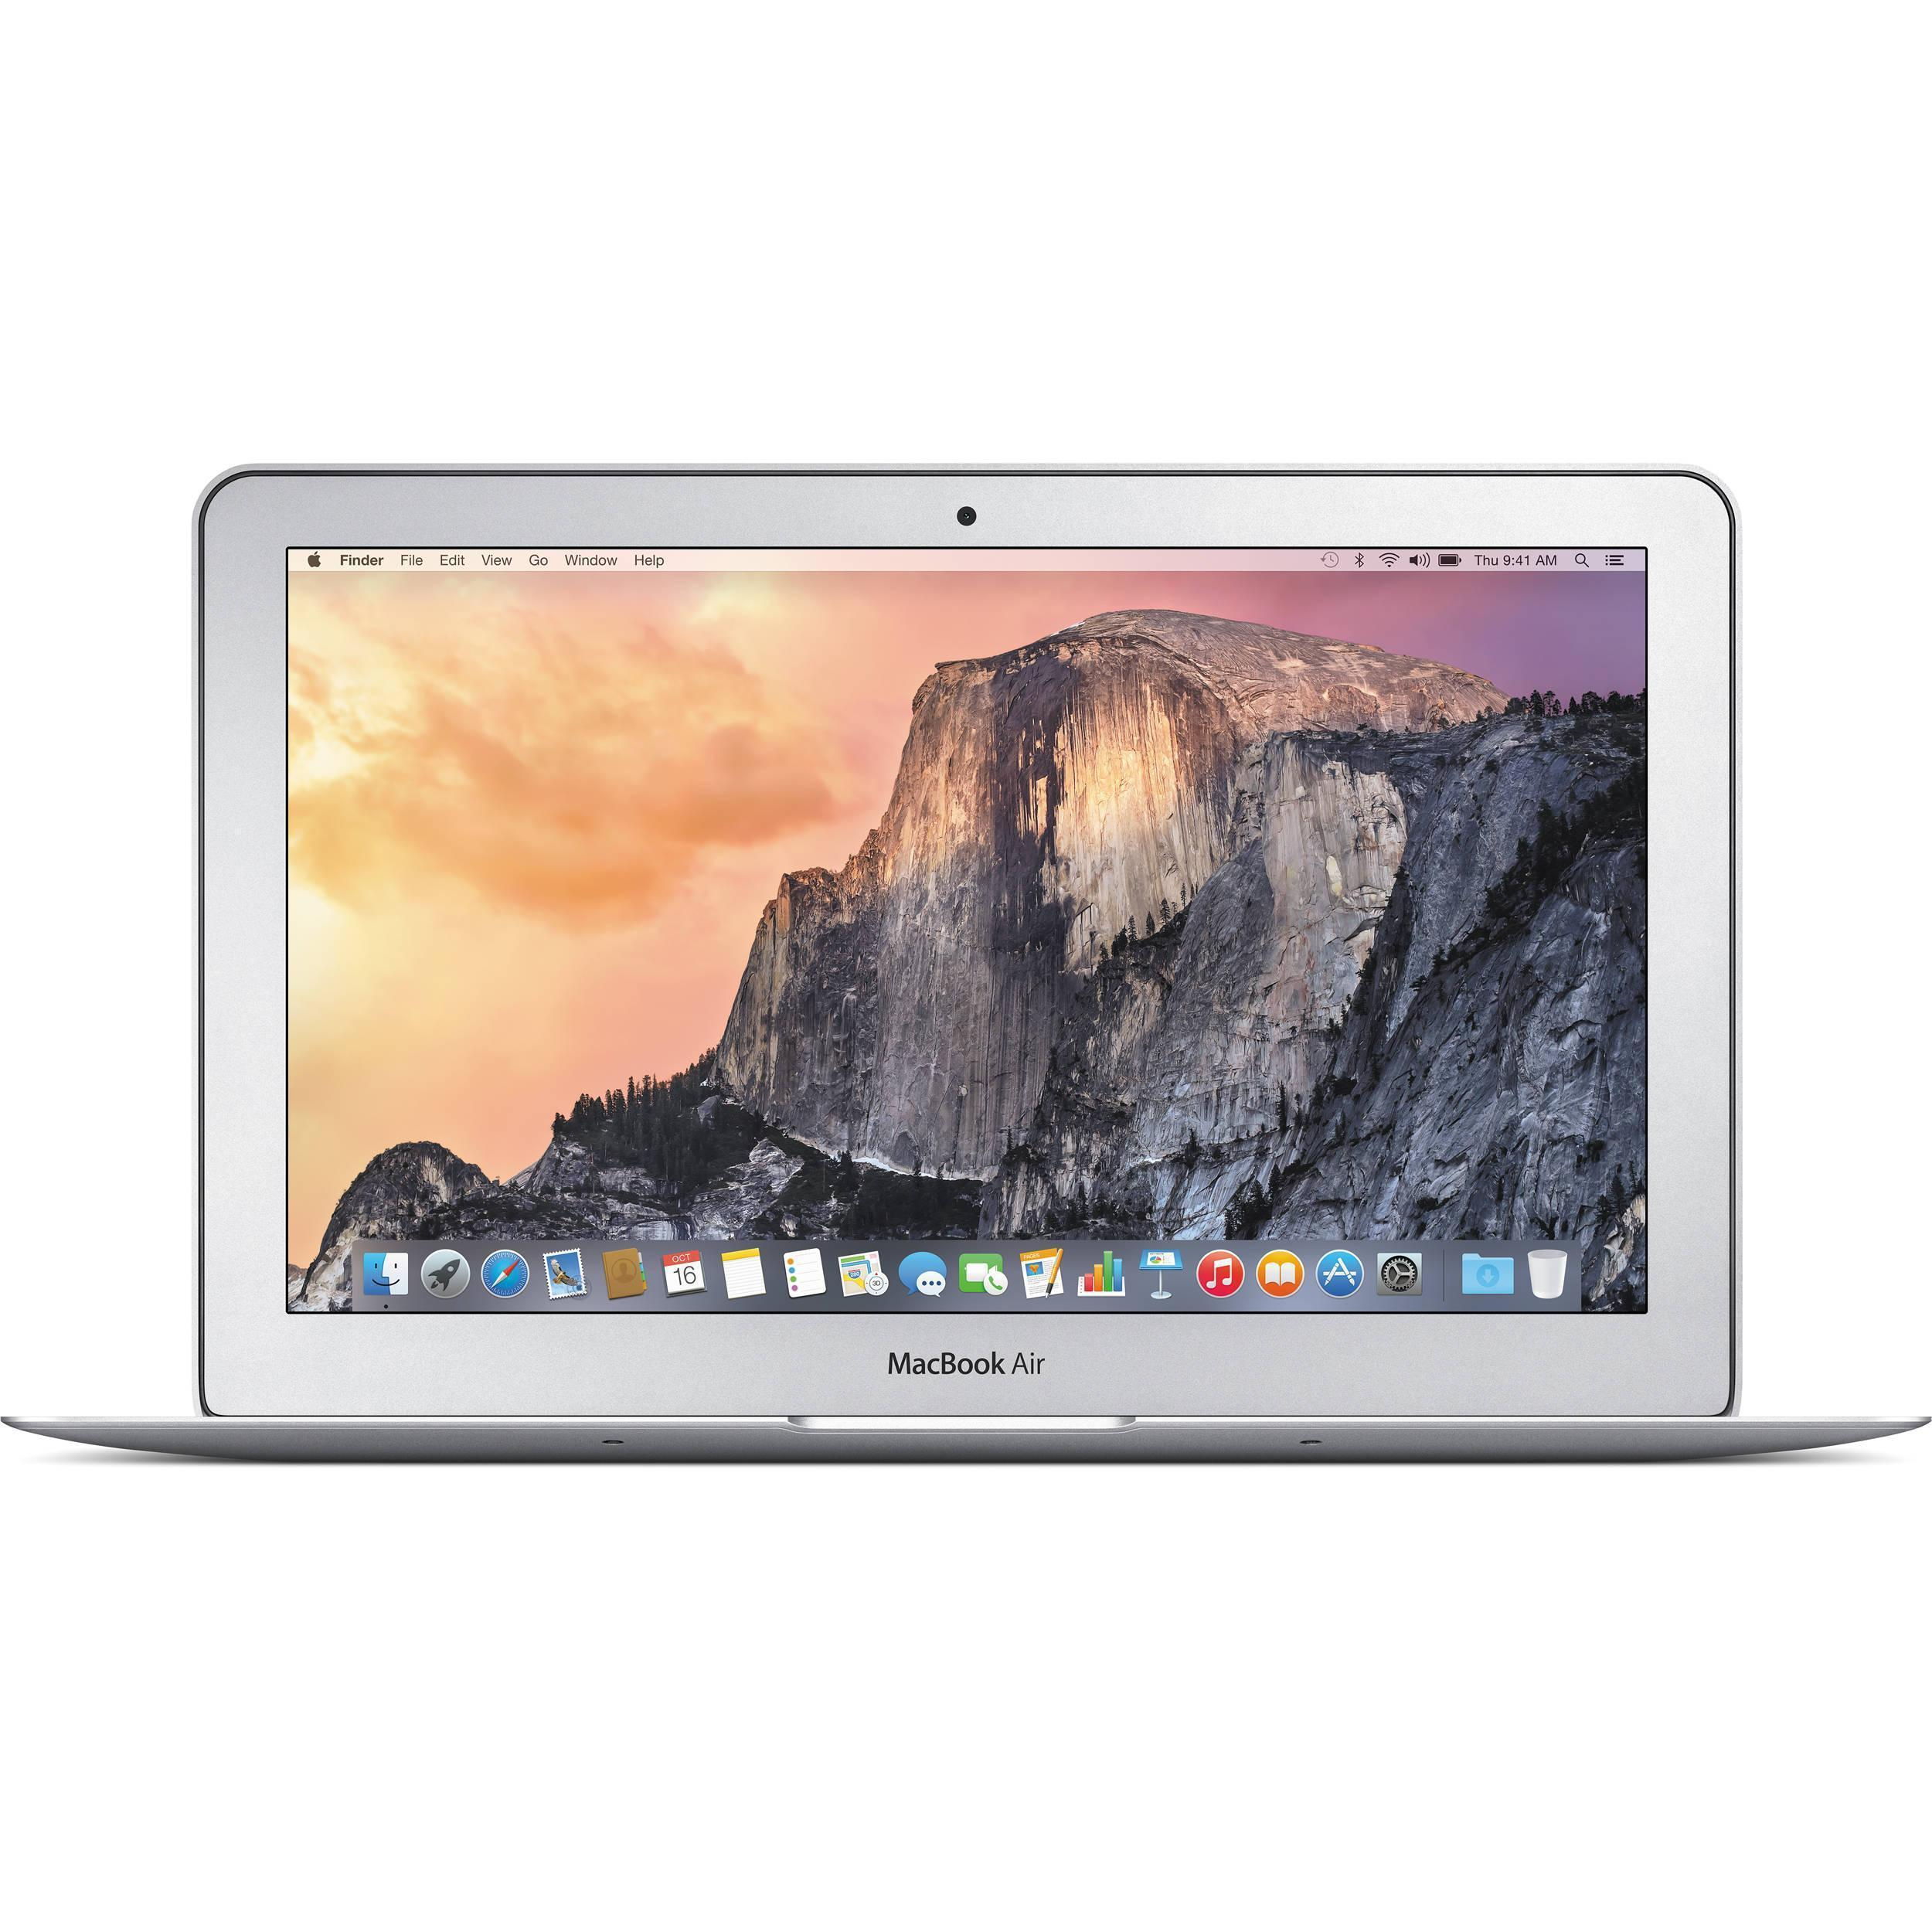 MacBook Air 11,6-tum (2015) - Core i5 - 4GB - SSD 128 GB QWERTY - Engelska (Storbritannien)